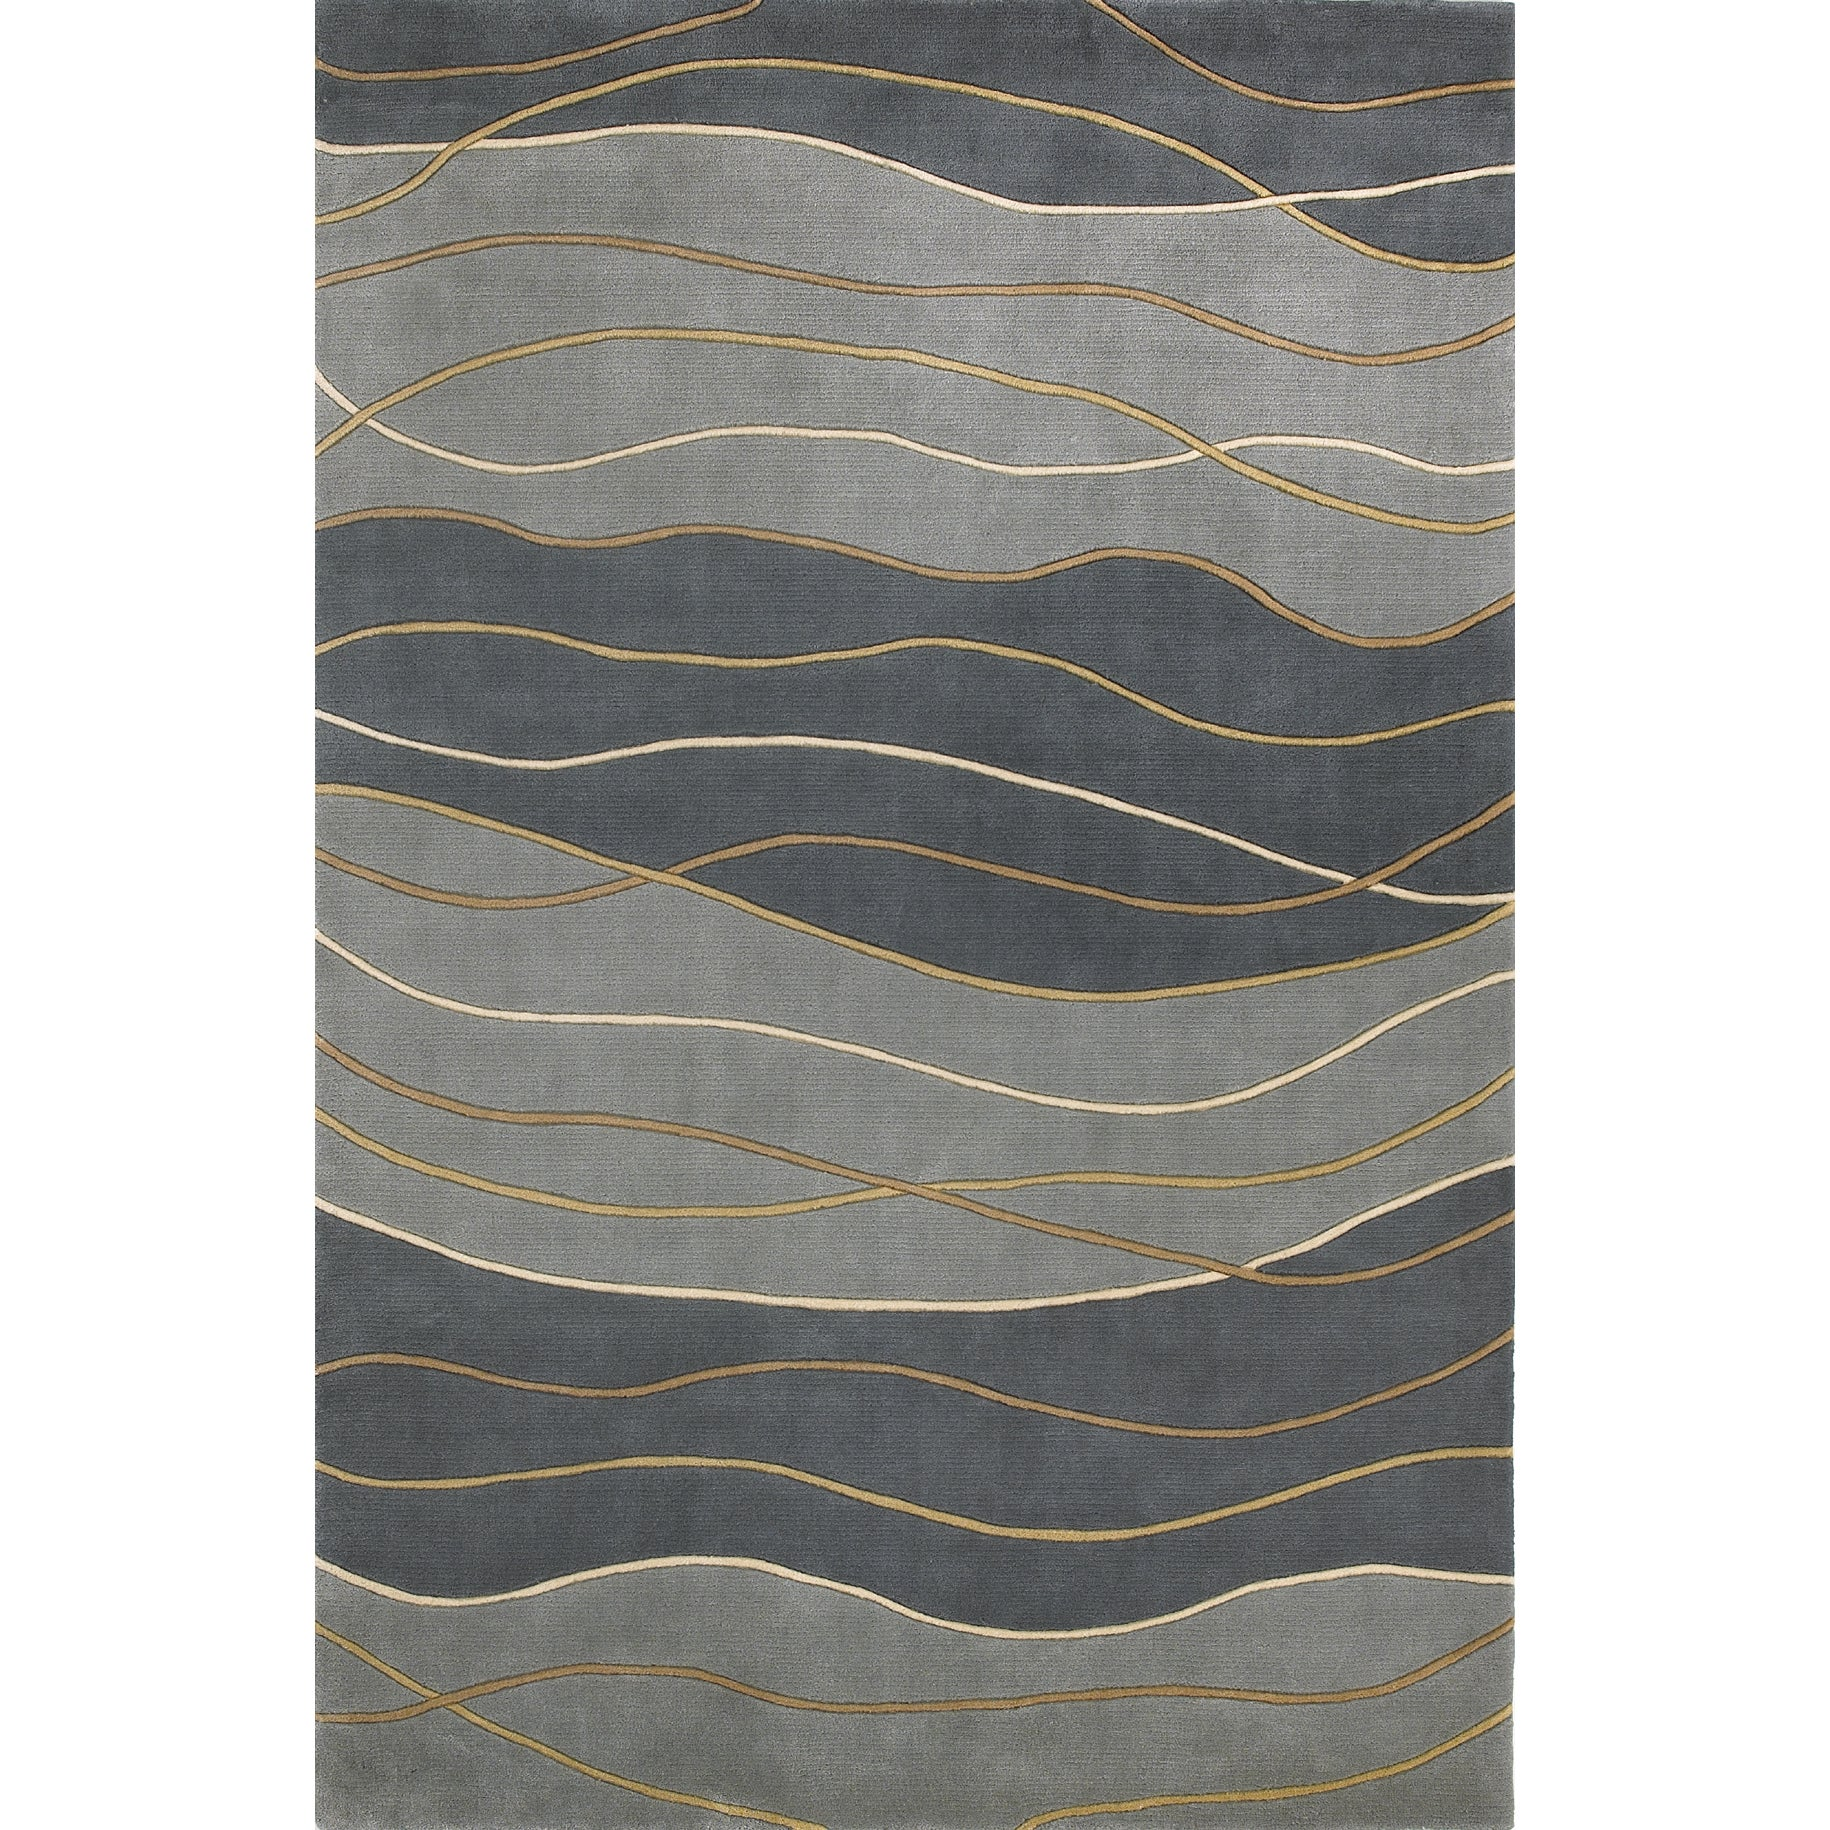 KAS Signature 9142 Seaside Waves Wool/Cotton Rug (7'6 Rou...